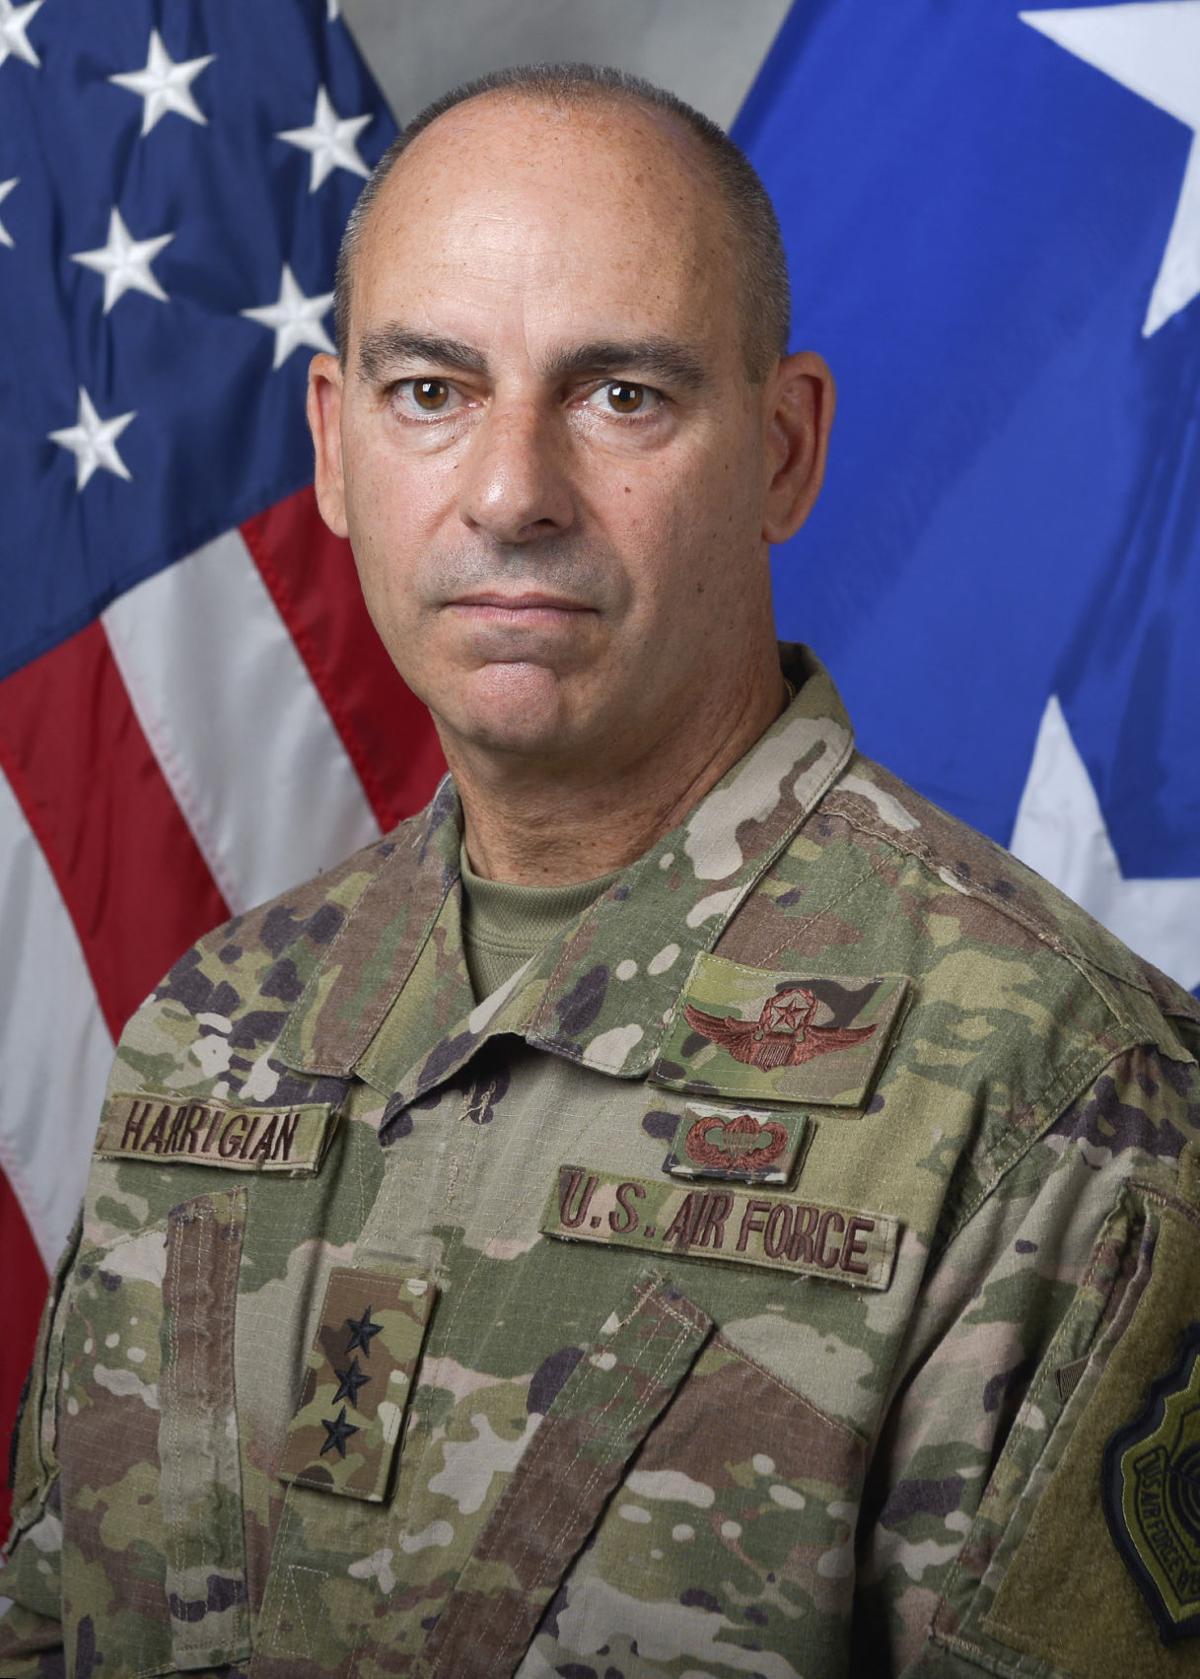 Official Photo of U.S. Air Force Lt. Gen. Jeffrey L. Harrigian